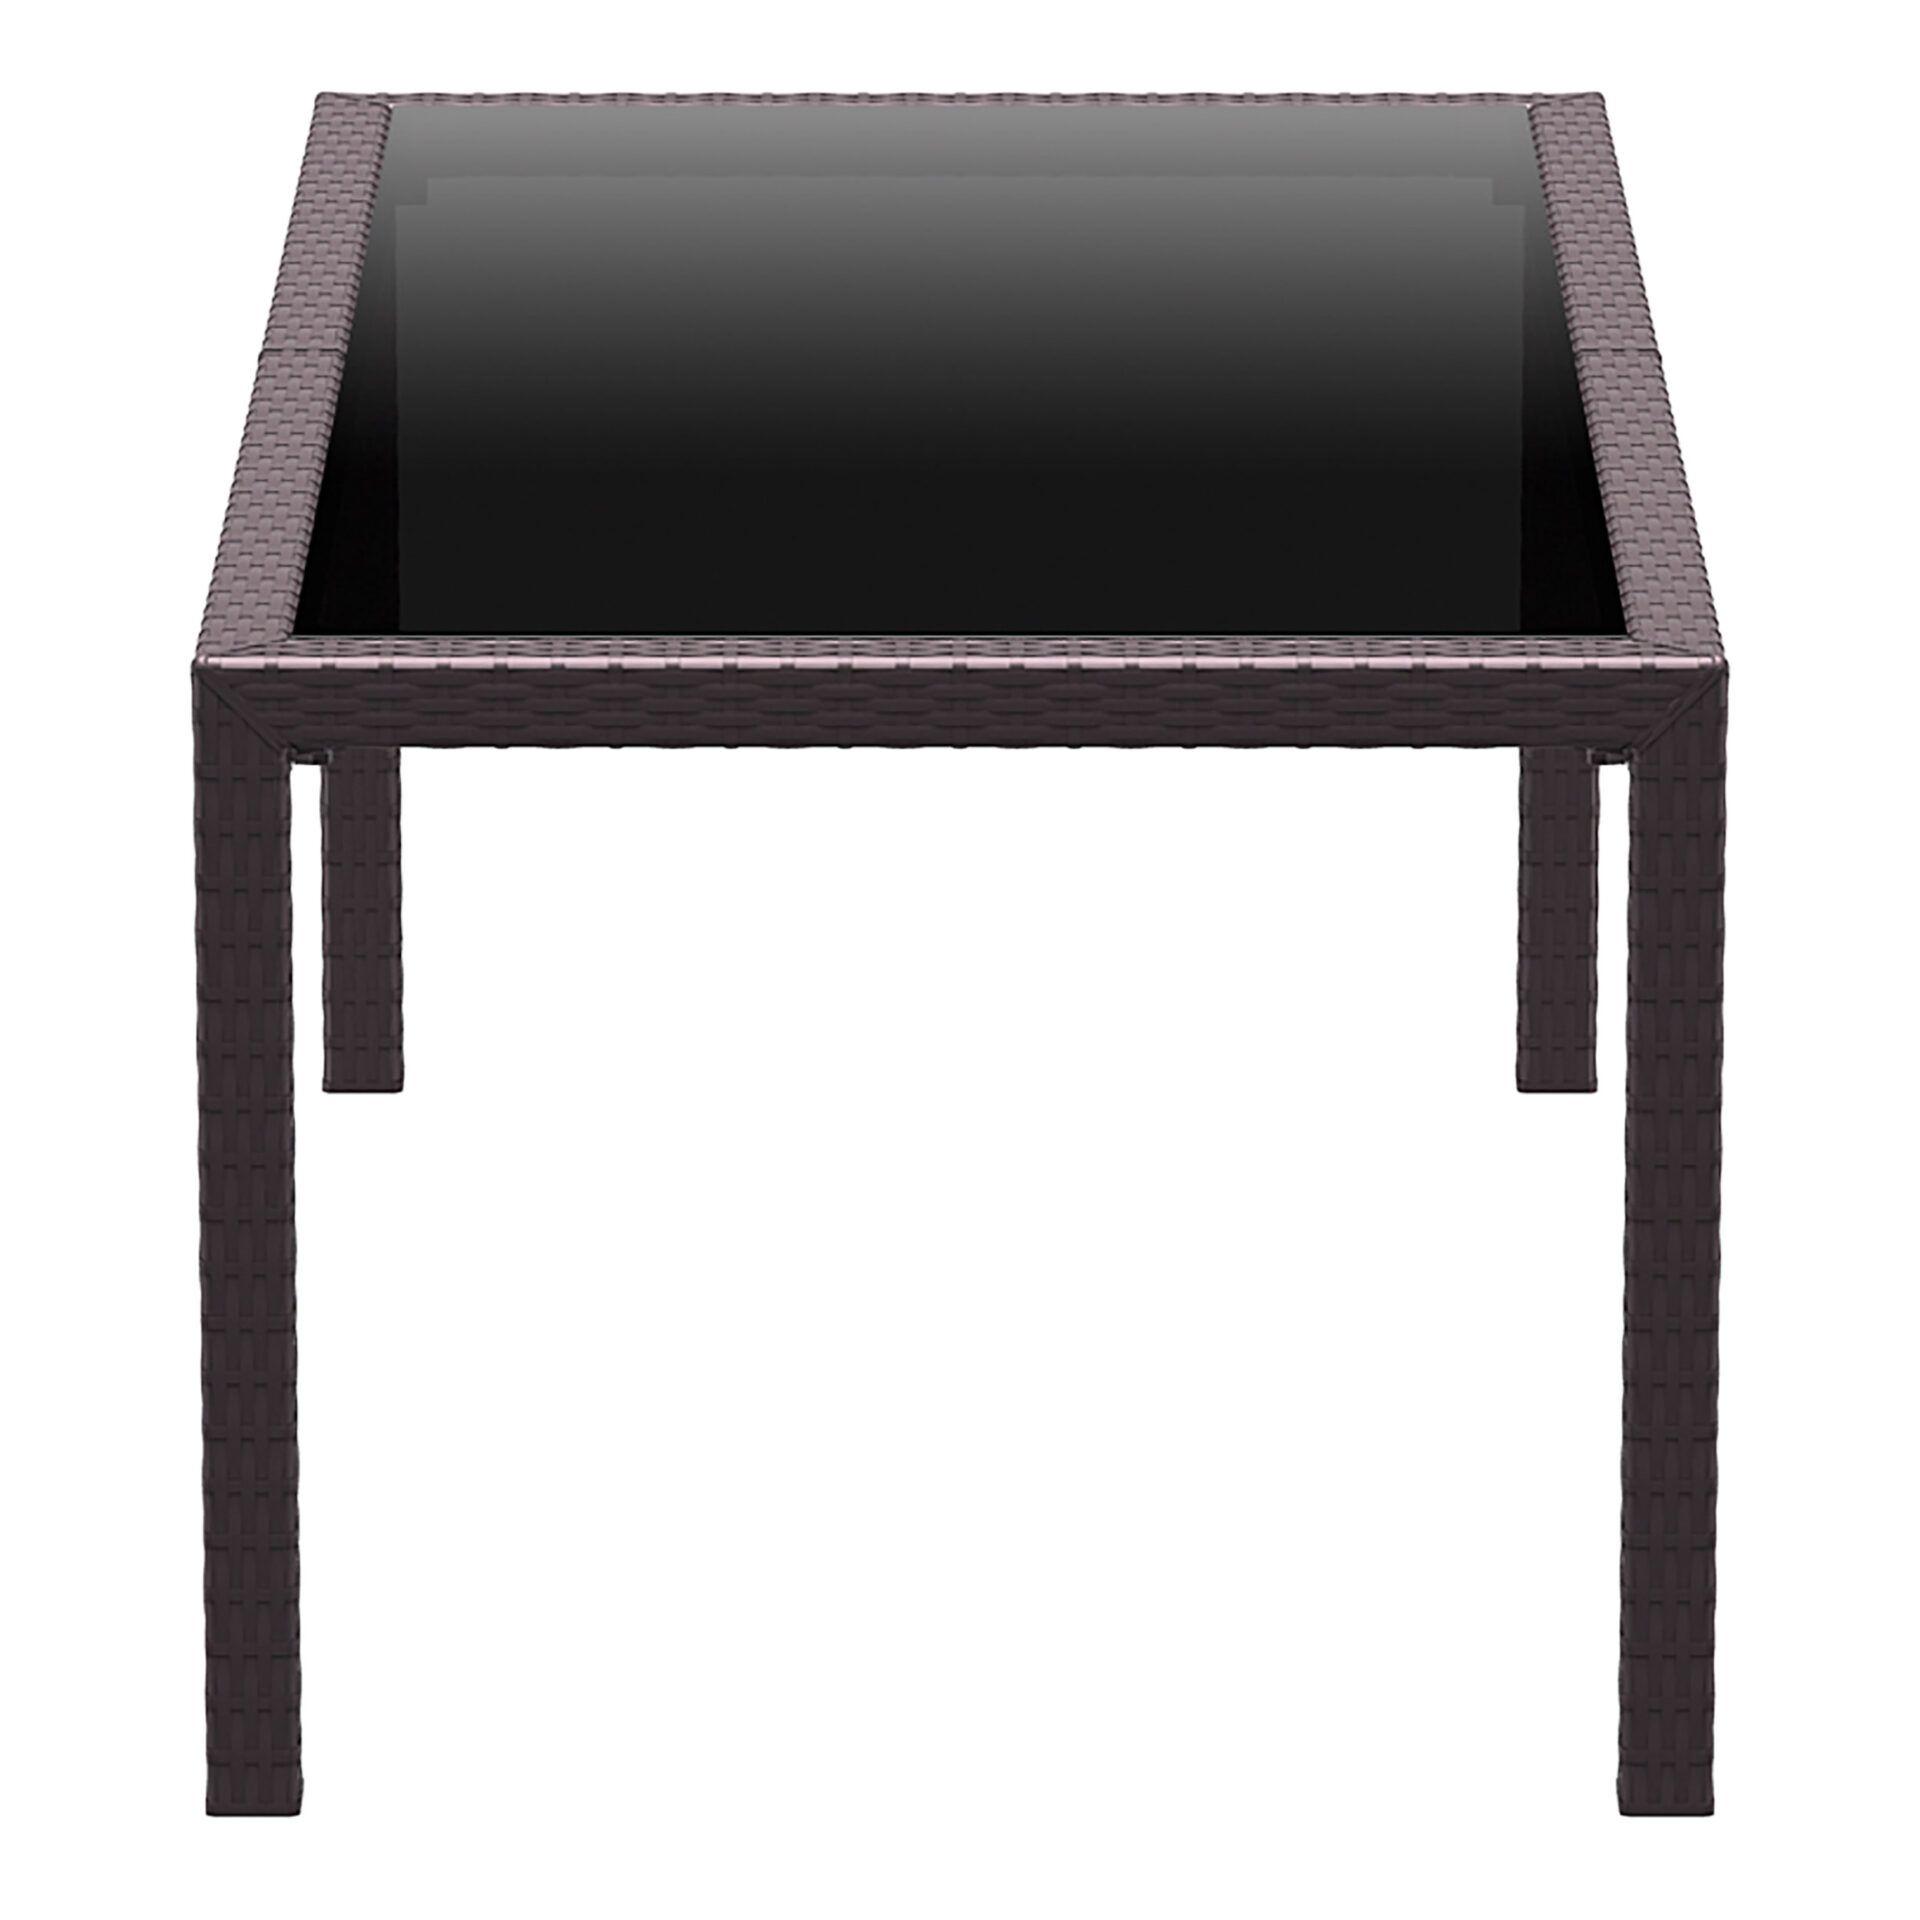 outdoor resin rattan dining glass top tahiti table brown short edge